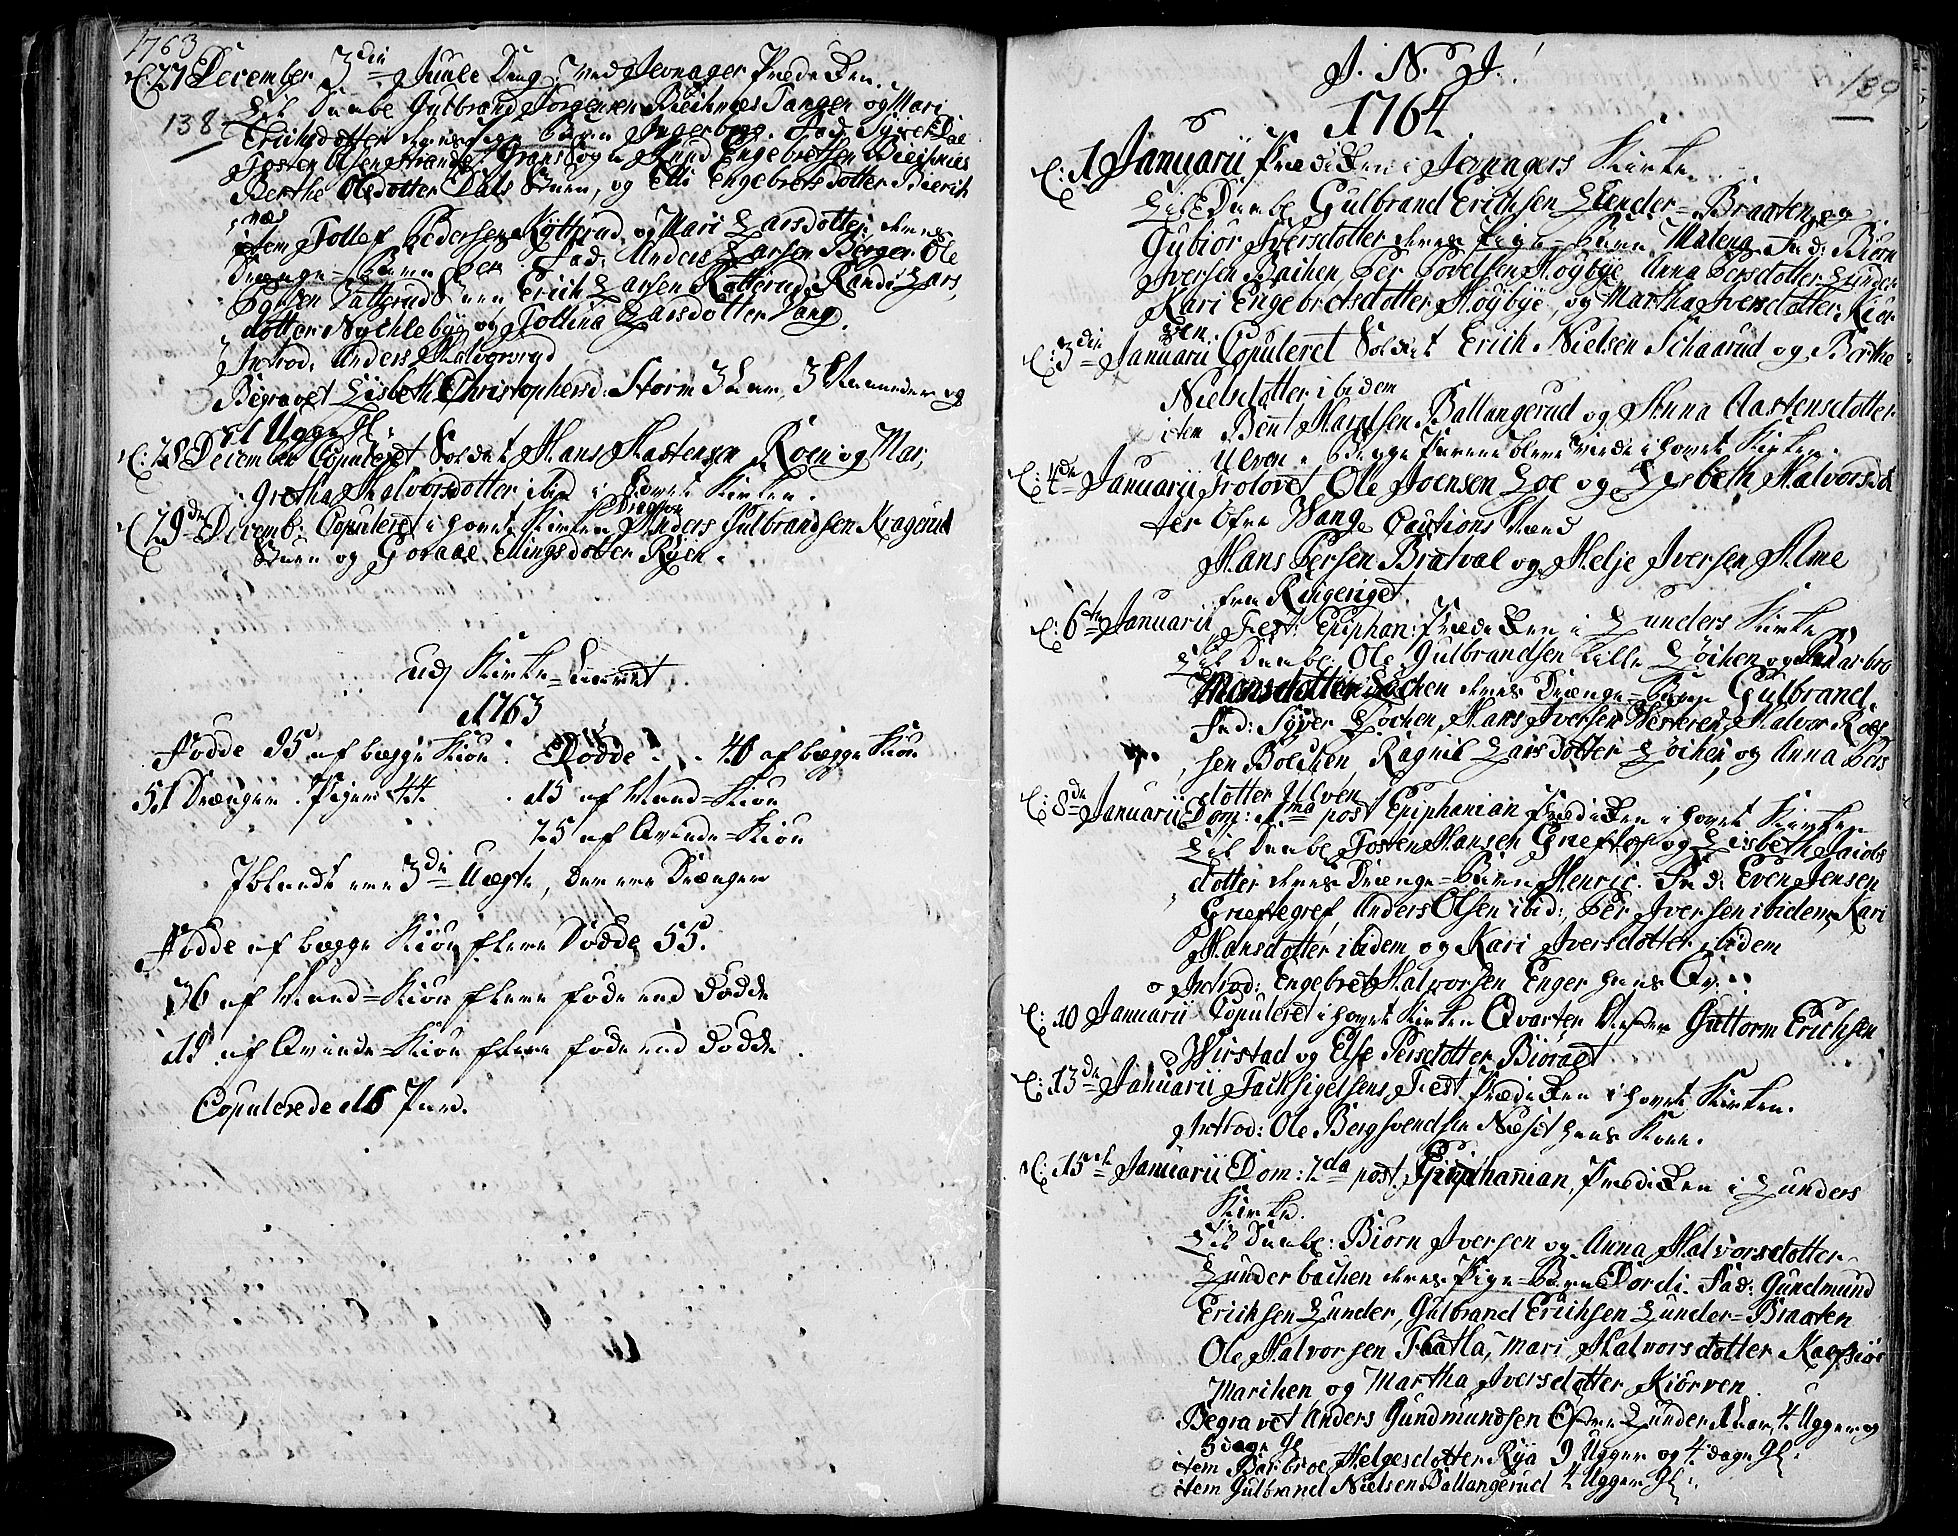 SAH, Jevnaker prestekontor, Ministerialbok nr. 3, 1752-1799, s. 138-139